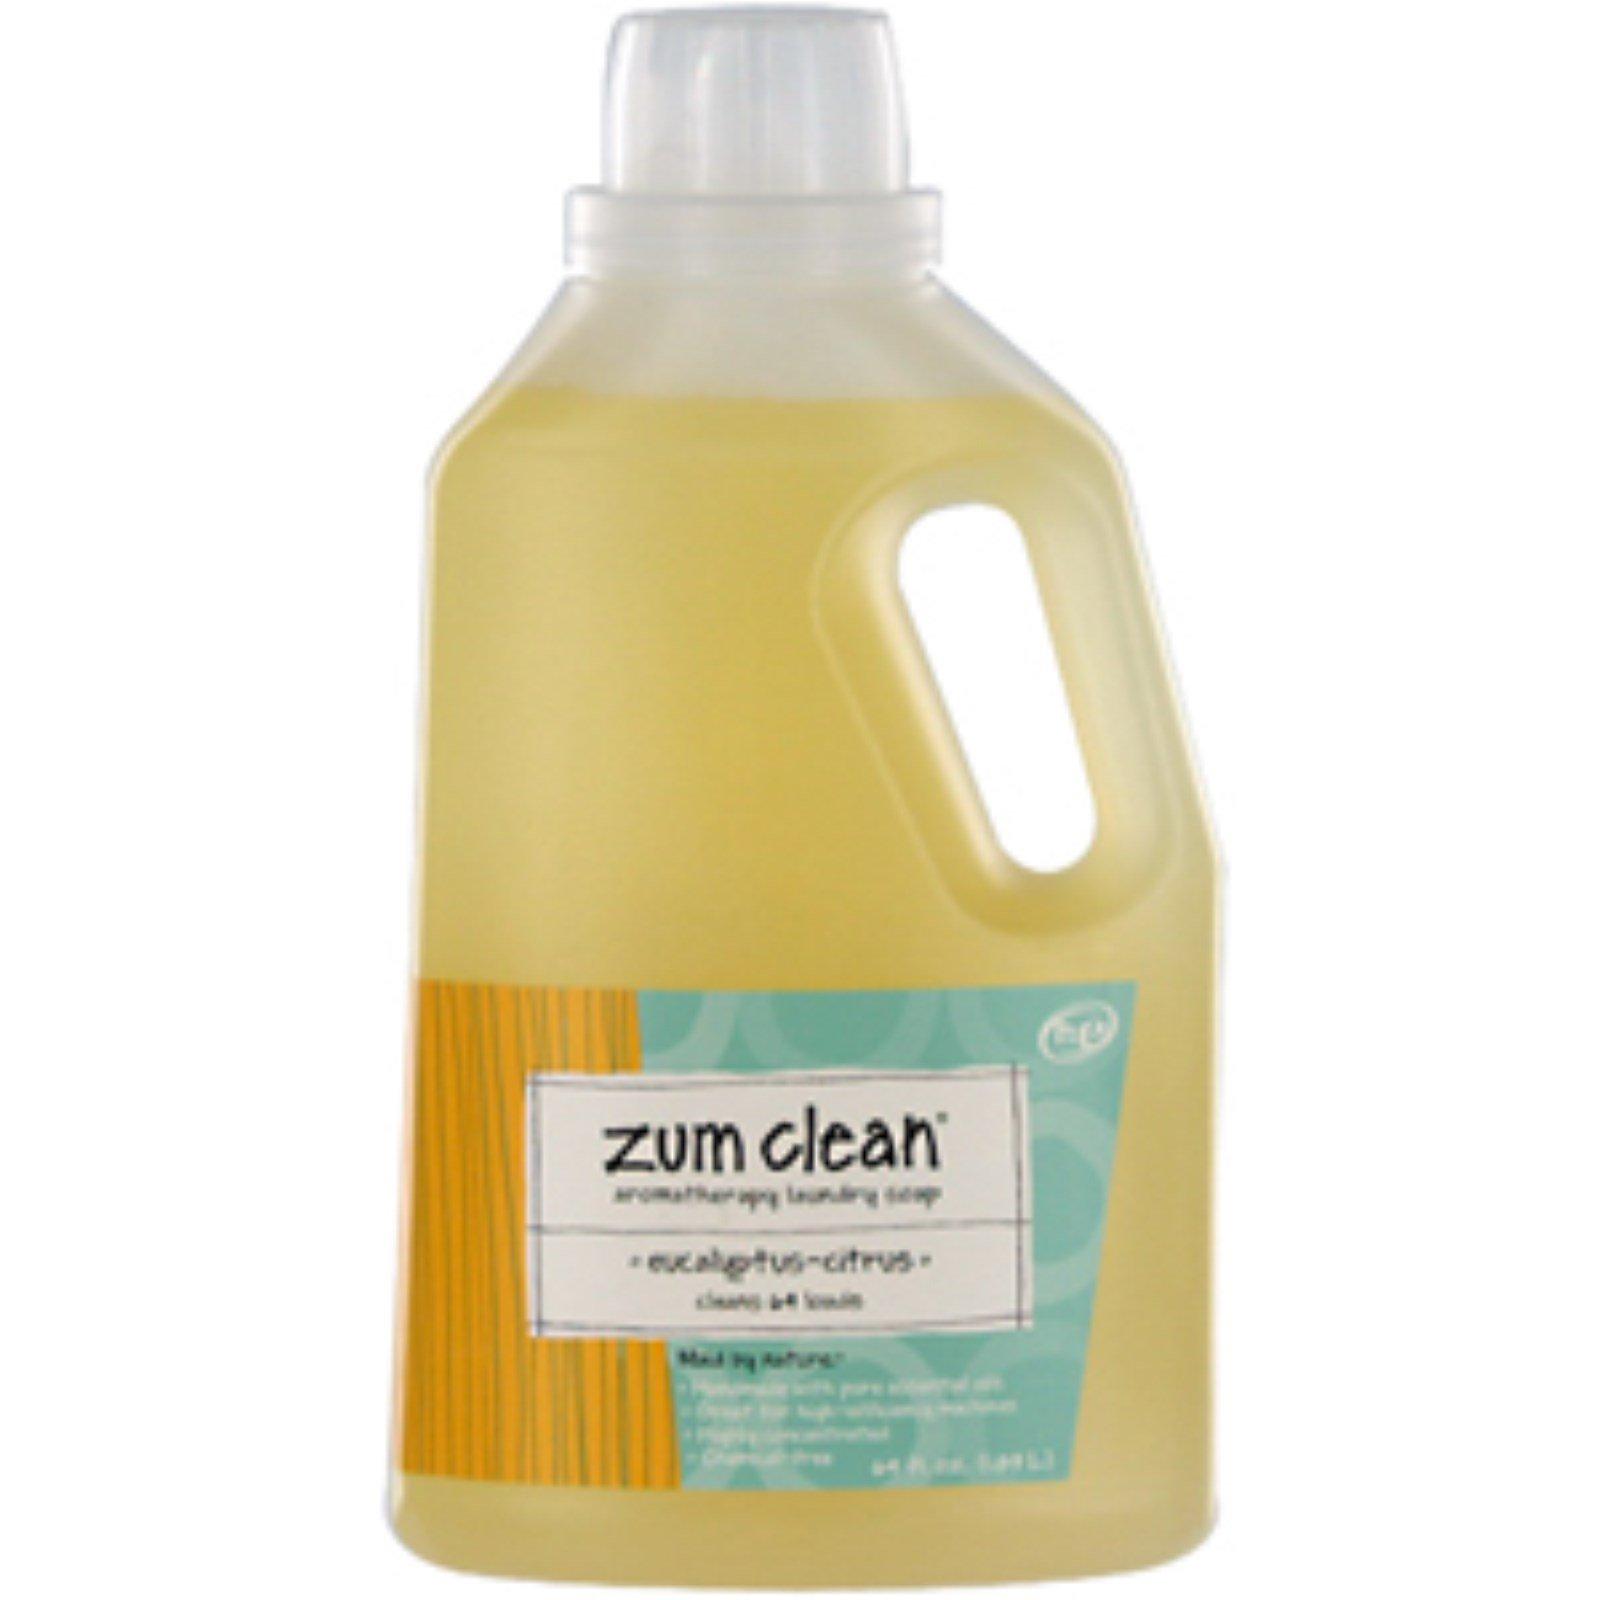 Indigo Wild Zum Clean Aromatherapy Laundry Soap Eucalyptus